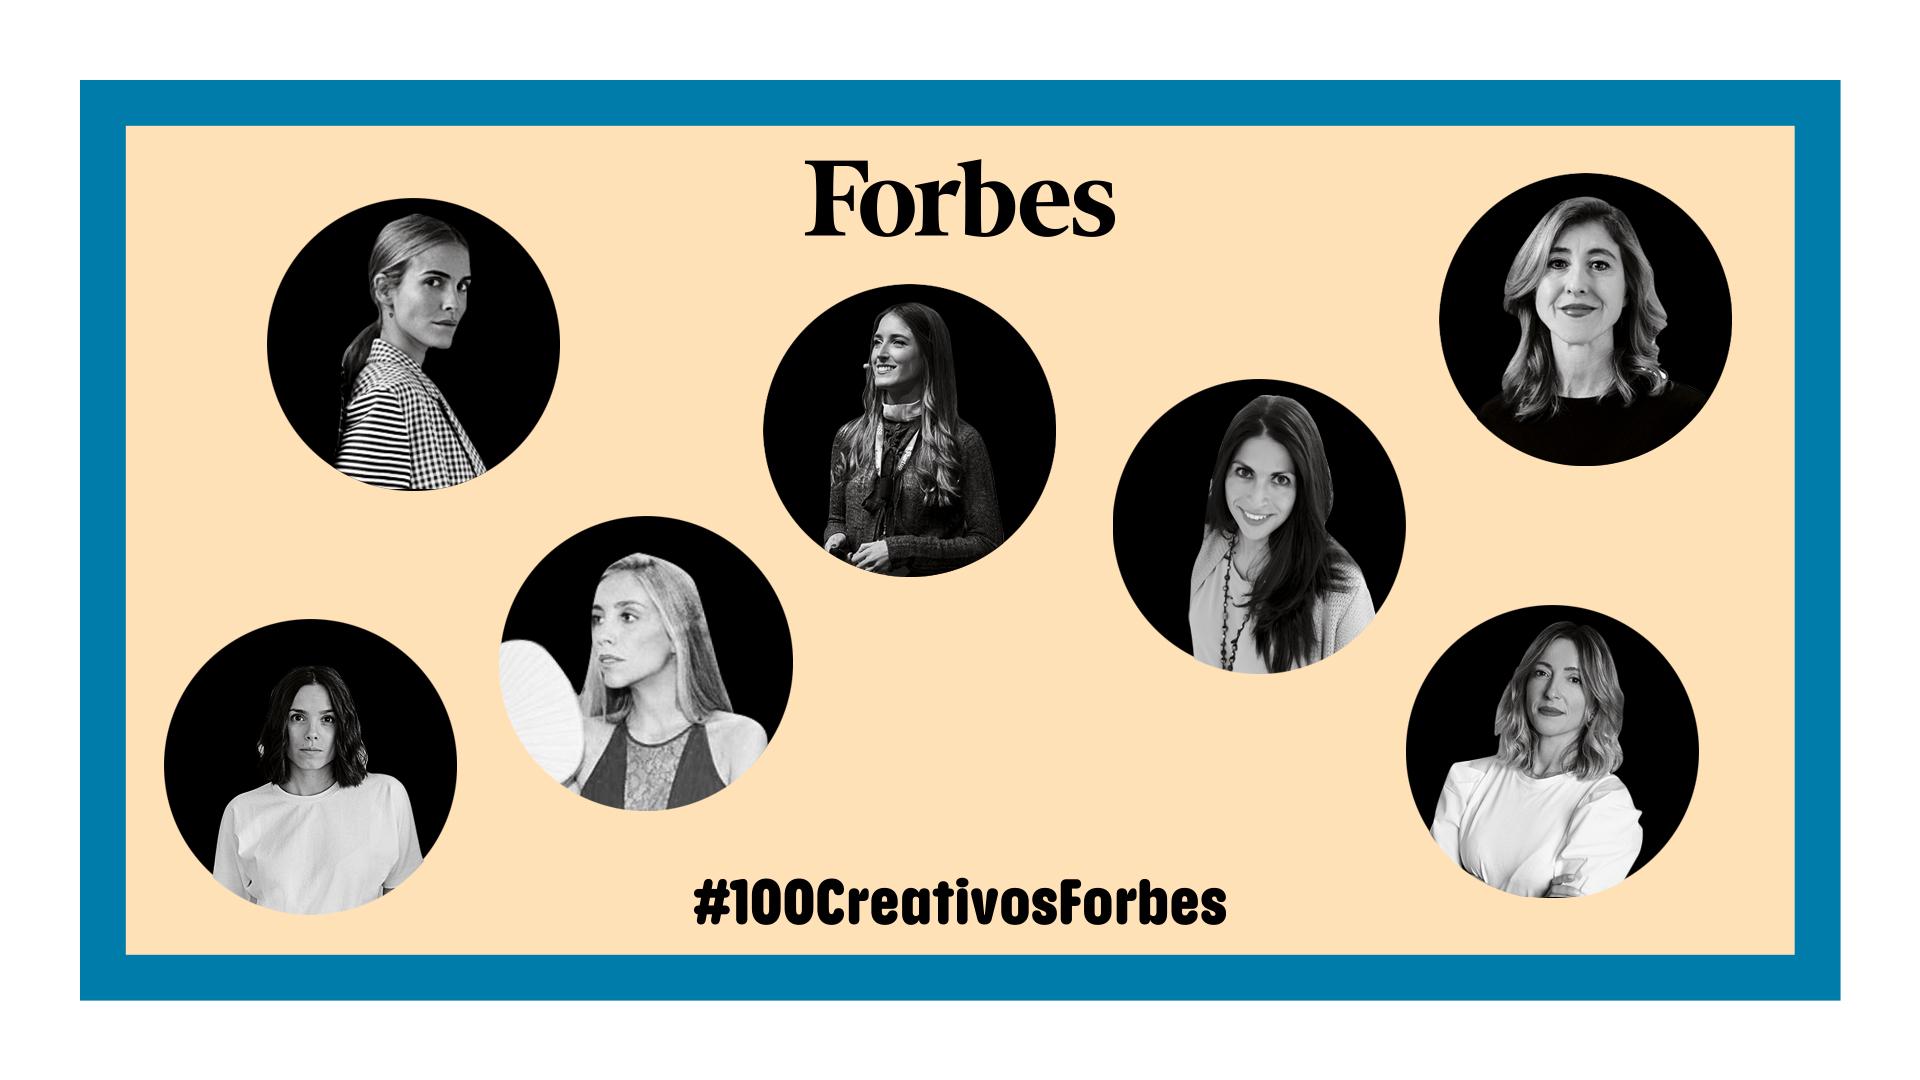 Forbes mujeres creativas 2020